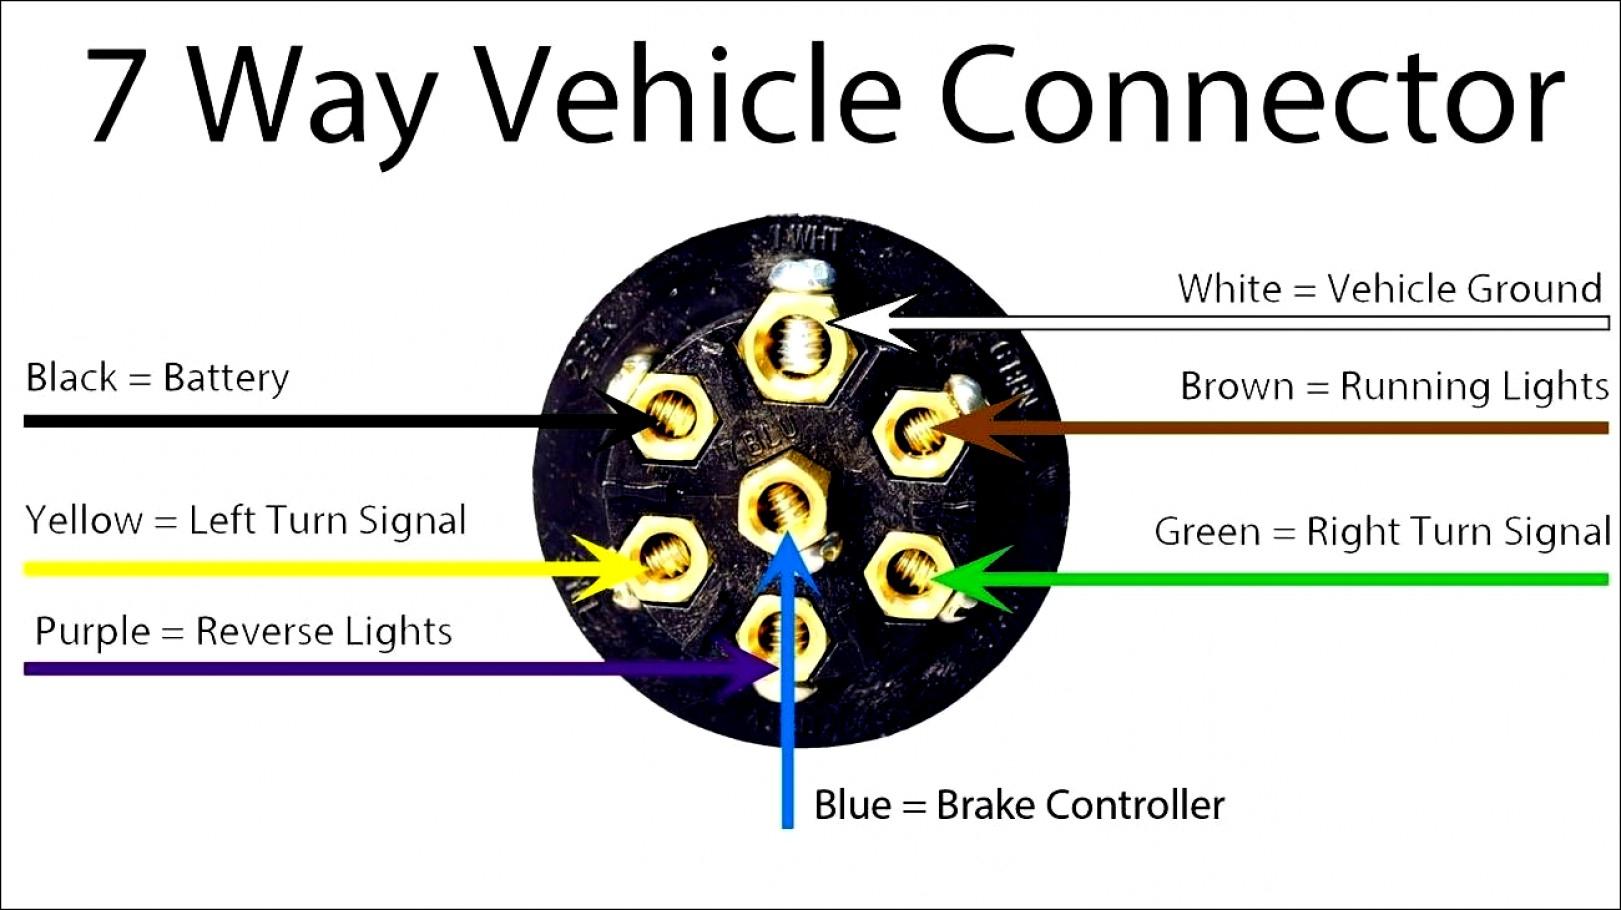 7 Way Light Diagram - Wiring Diagram Data - 7 Wire Trailer Wiring Diagram